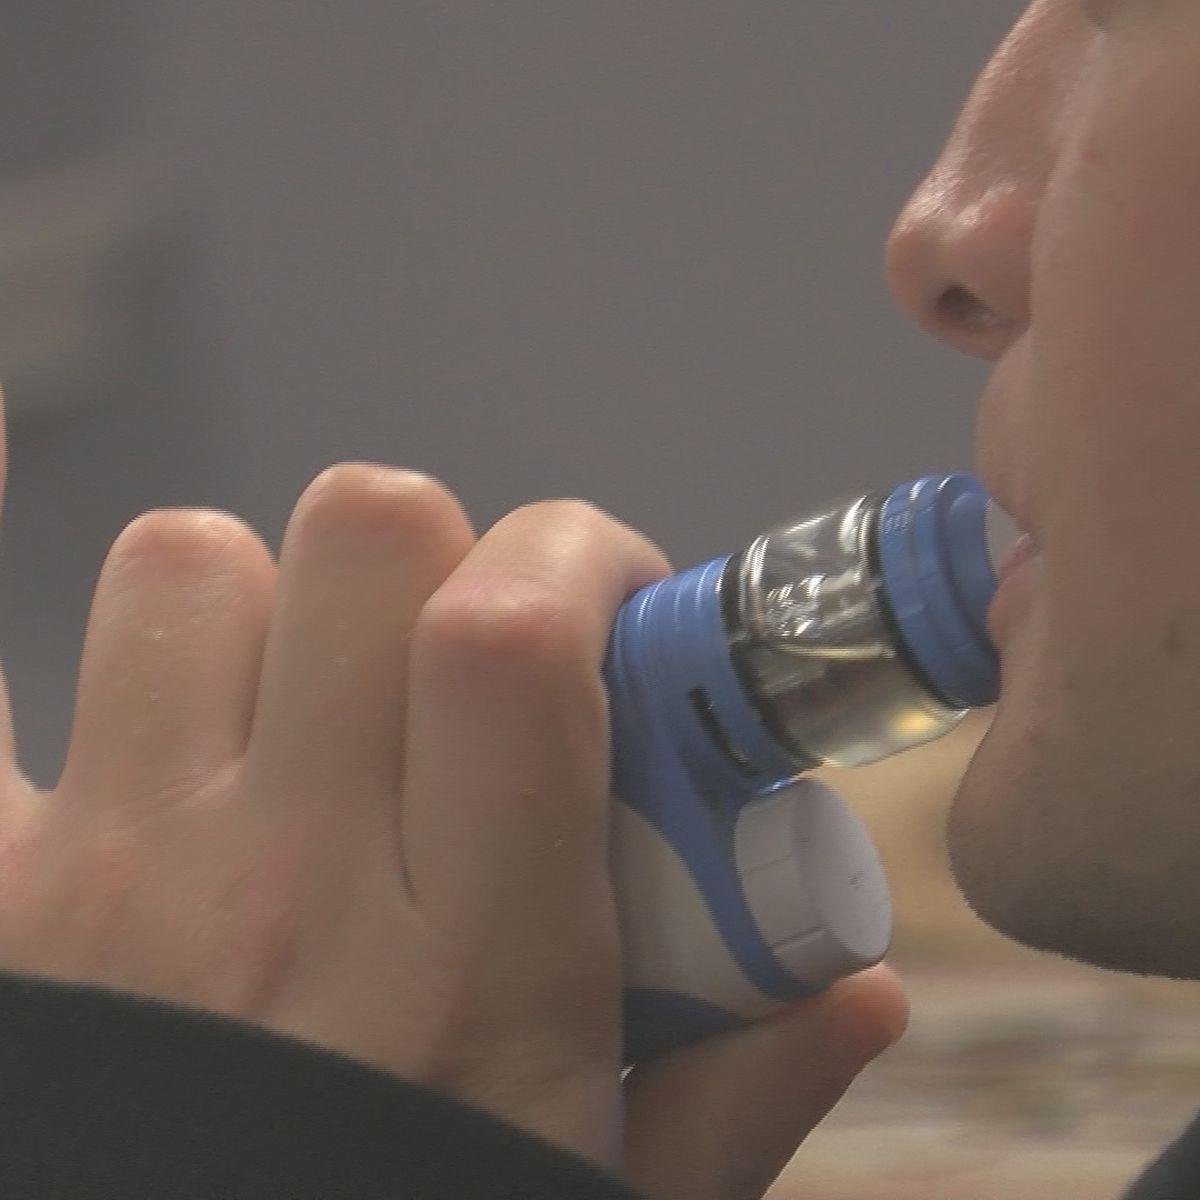 Louisiana bill would raise smoking age to 21